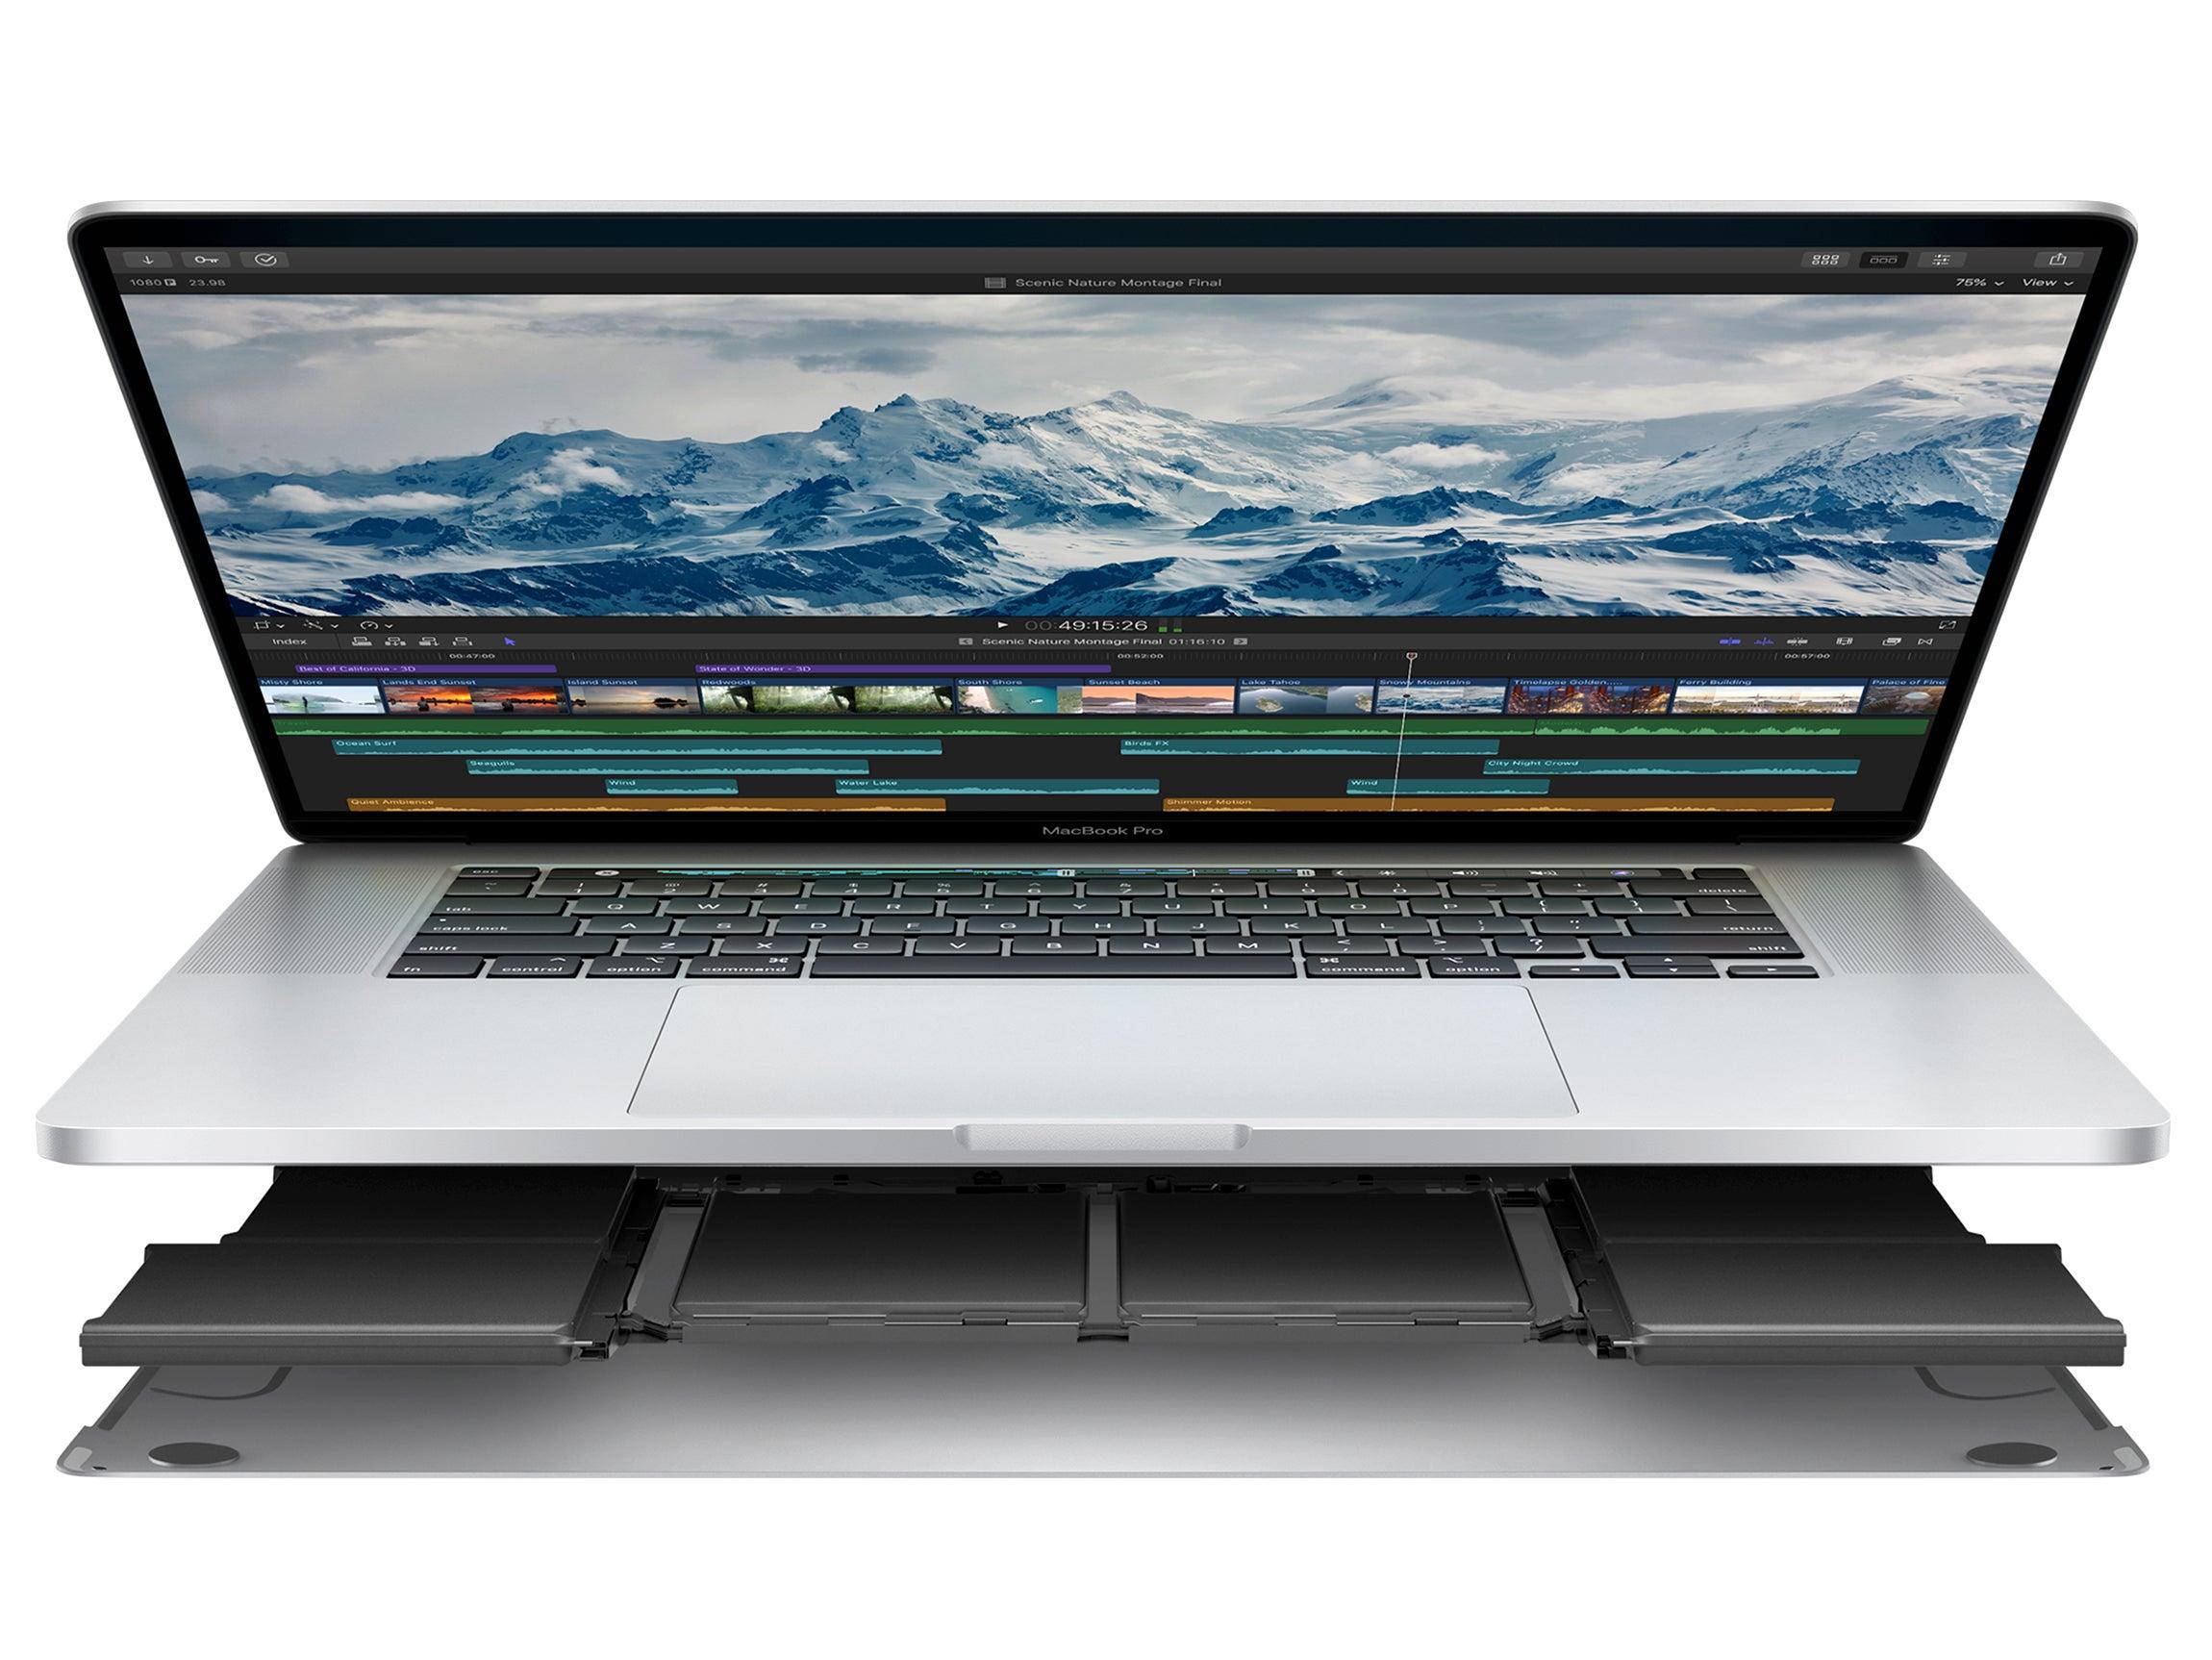 MacBook mit Akkuproblemen: Apple reagiert mit kostenlosen Reparaturen - inside digital